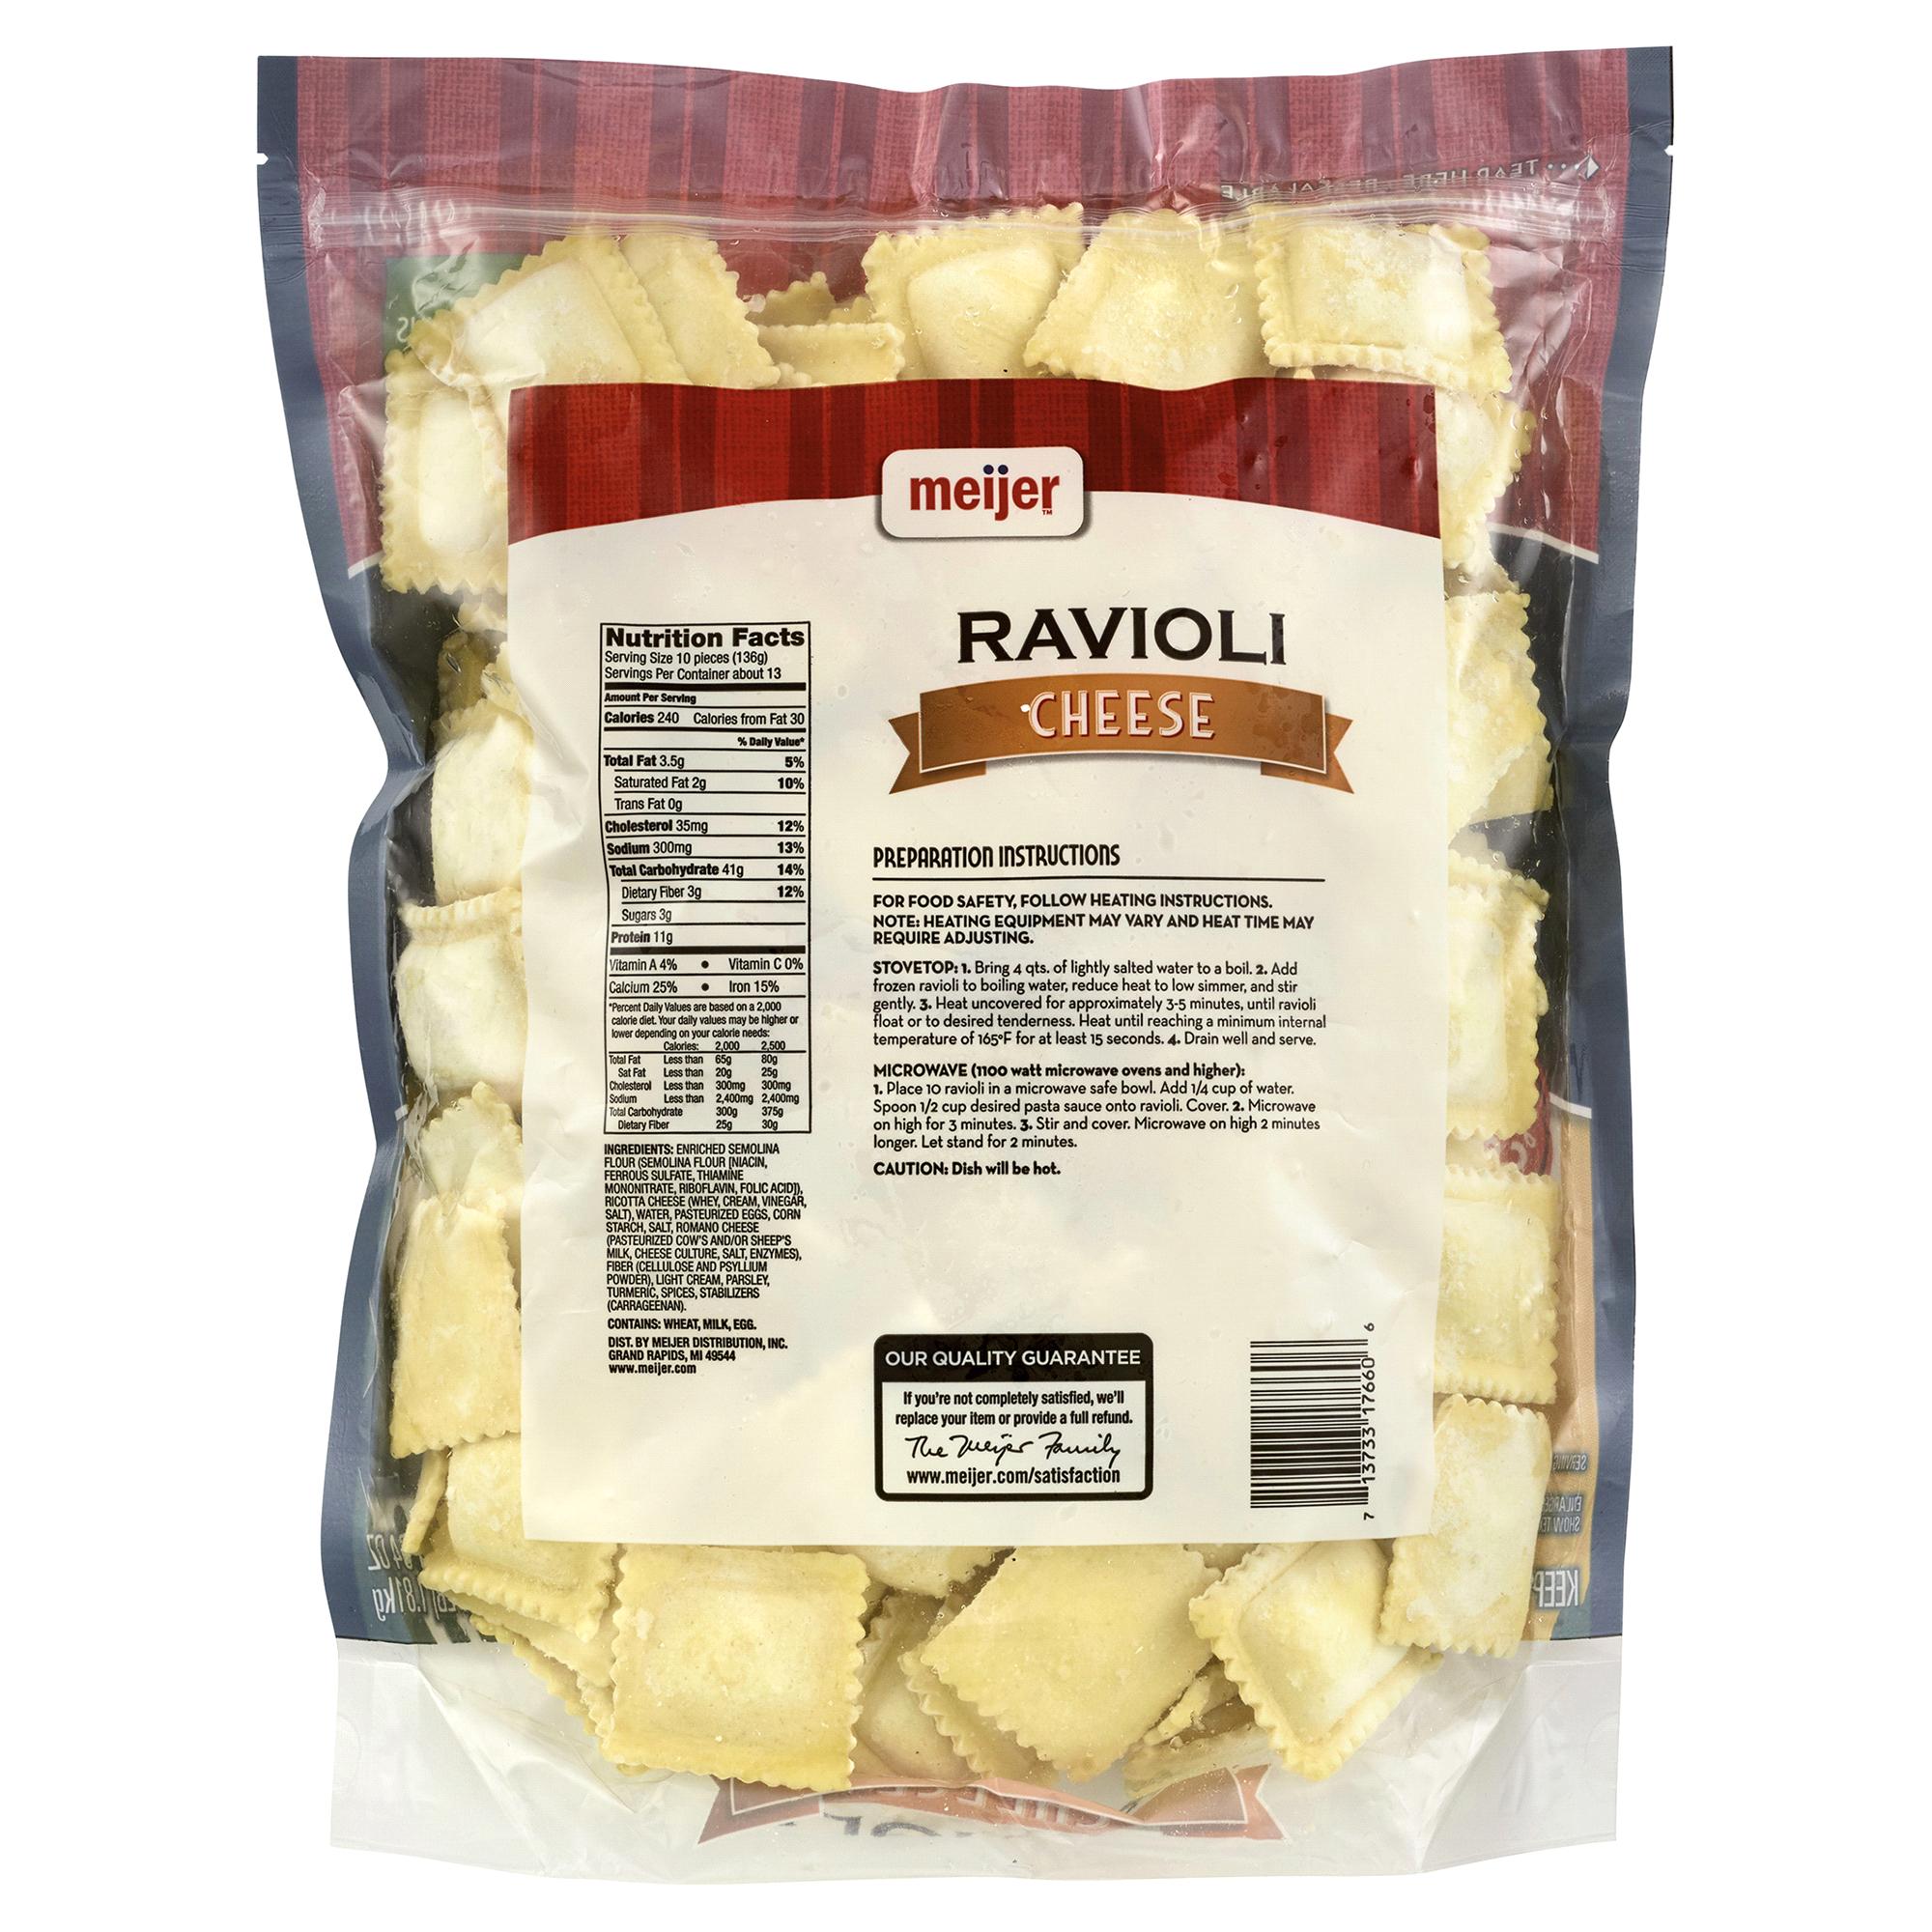 Meijer Cheese Ravioli - 64 oz. | Meijer.com